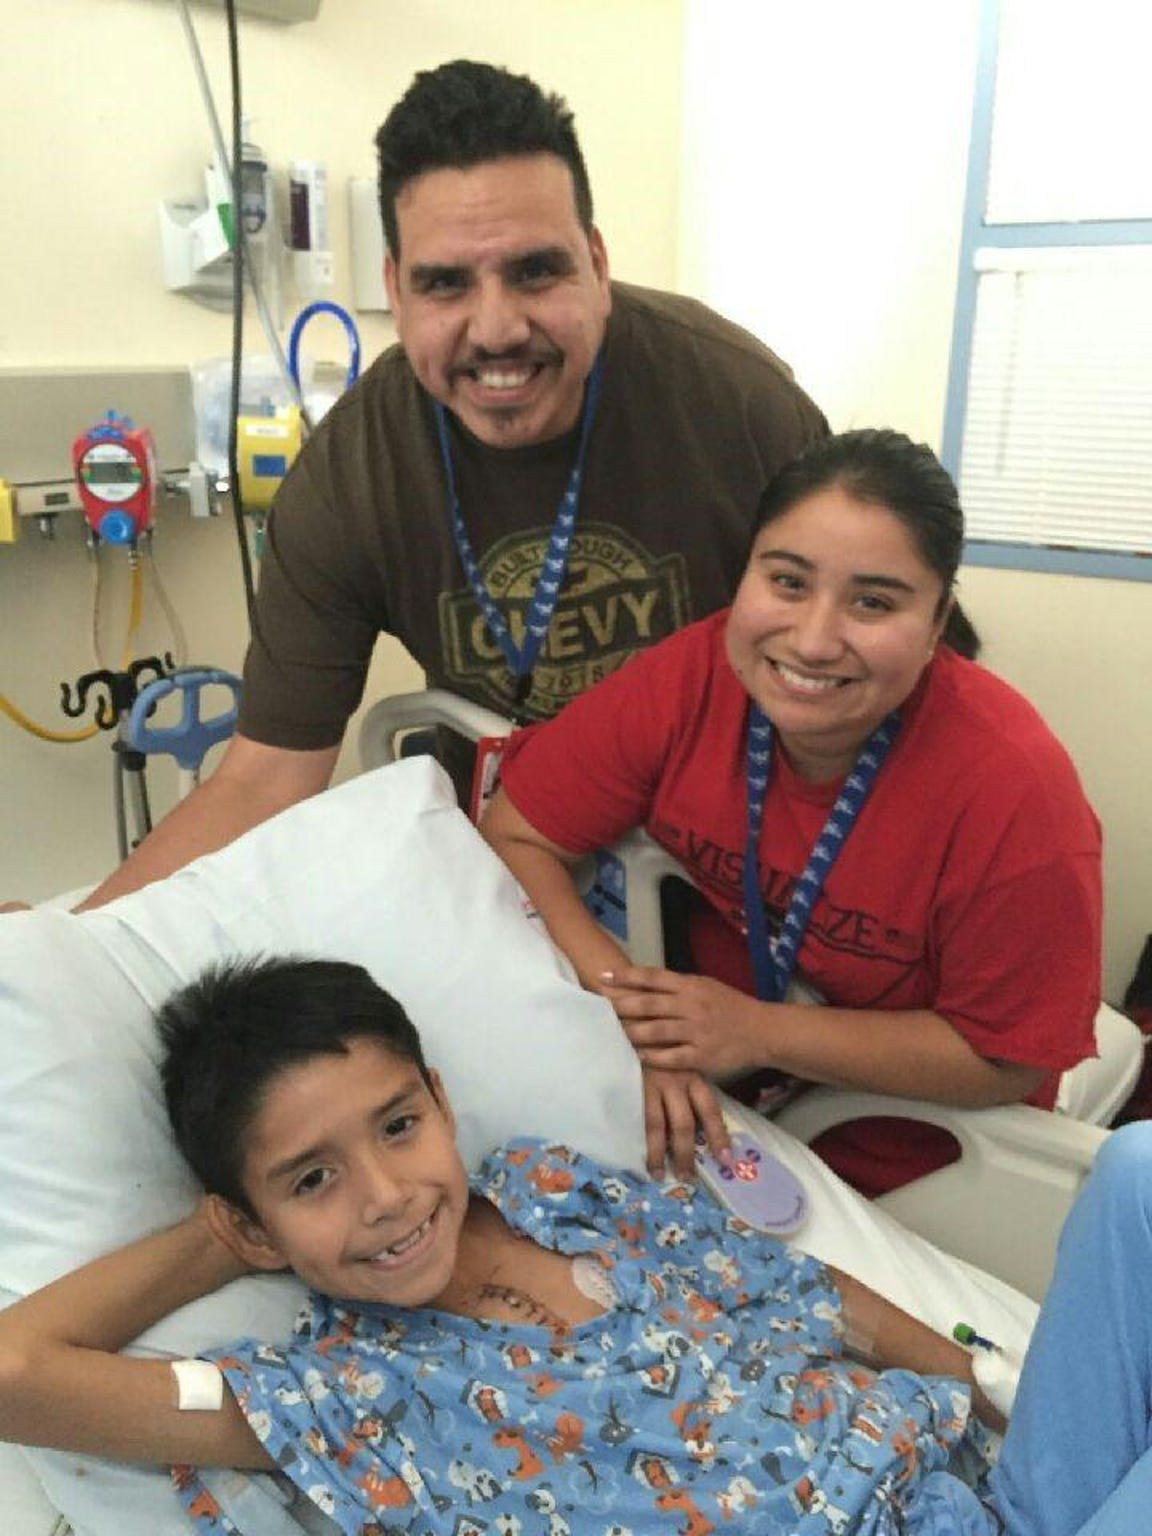 Parents Isaac, Sr. and Samantha Guajardo with their son, Isaac, Jr. following heart surgery.